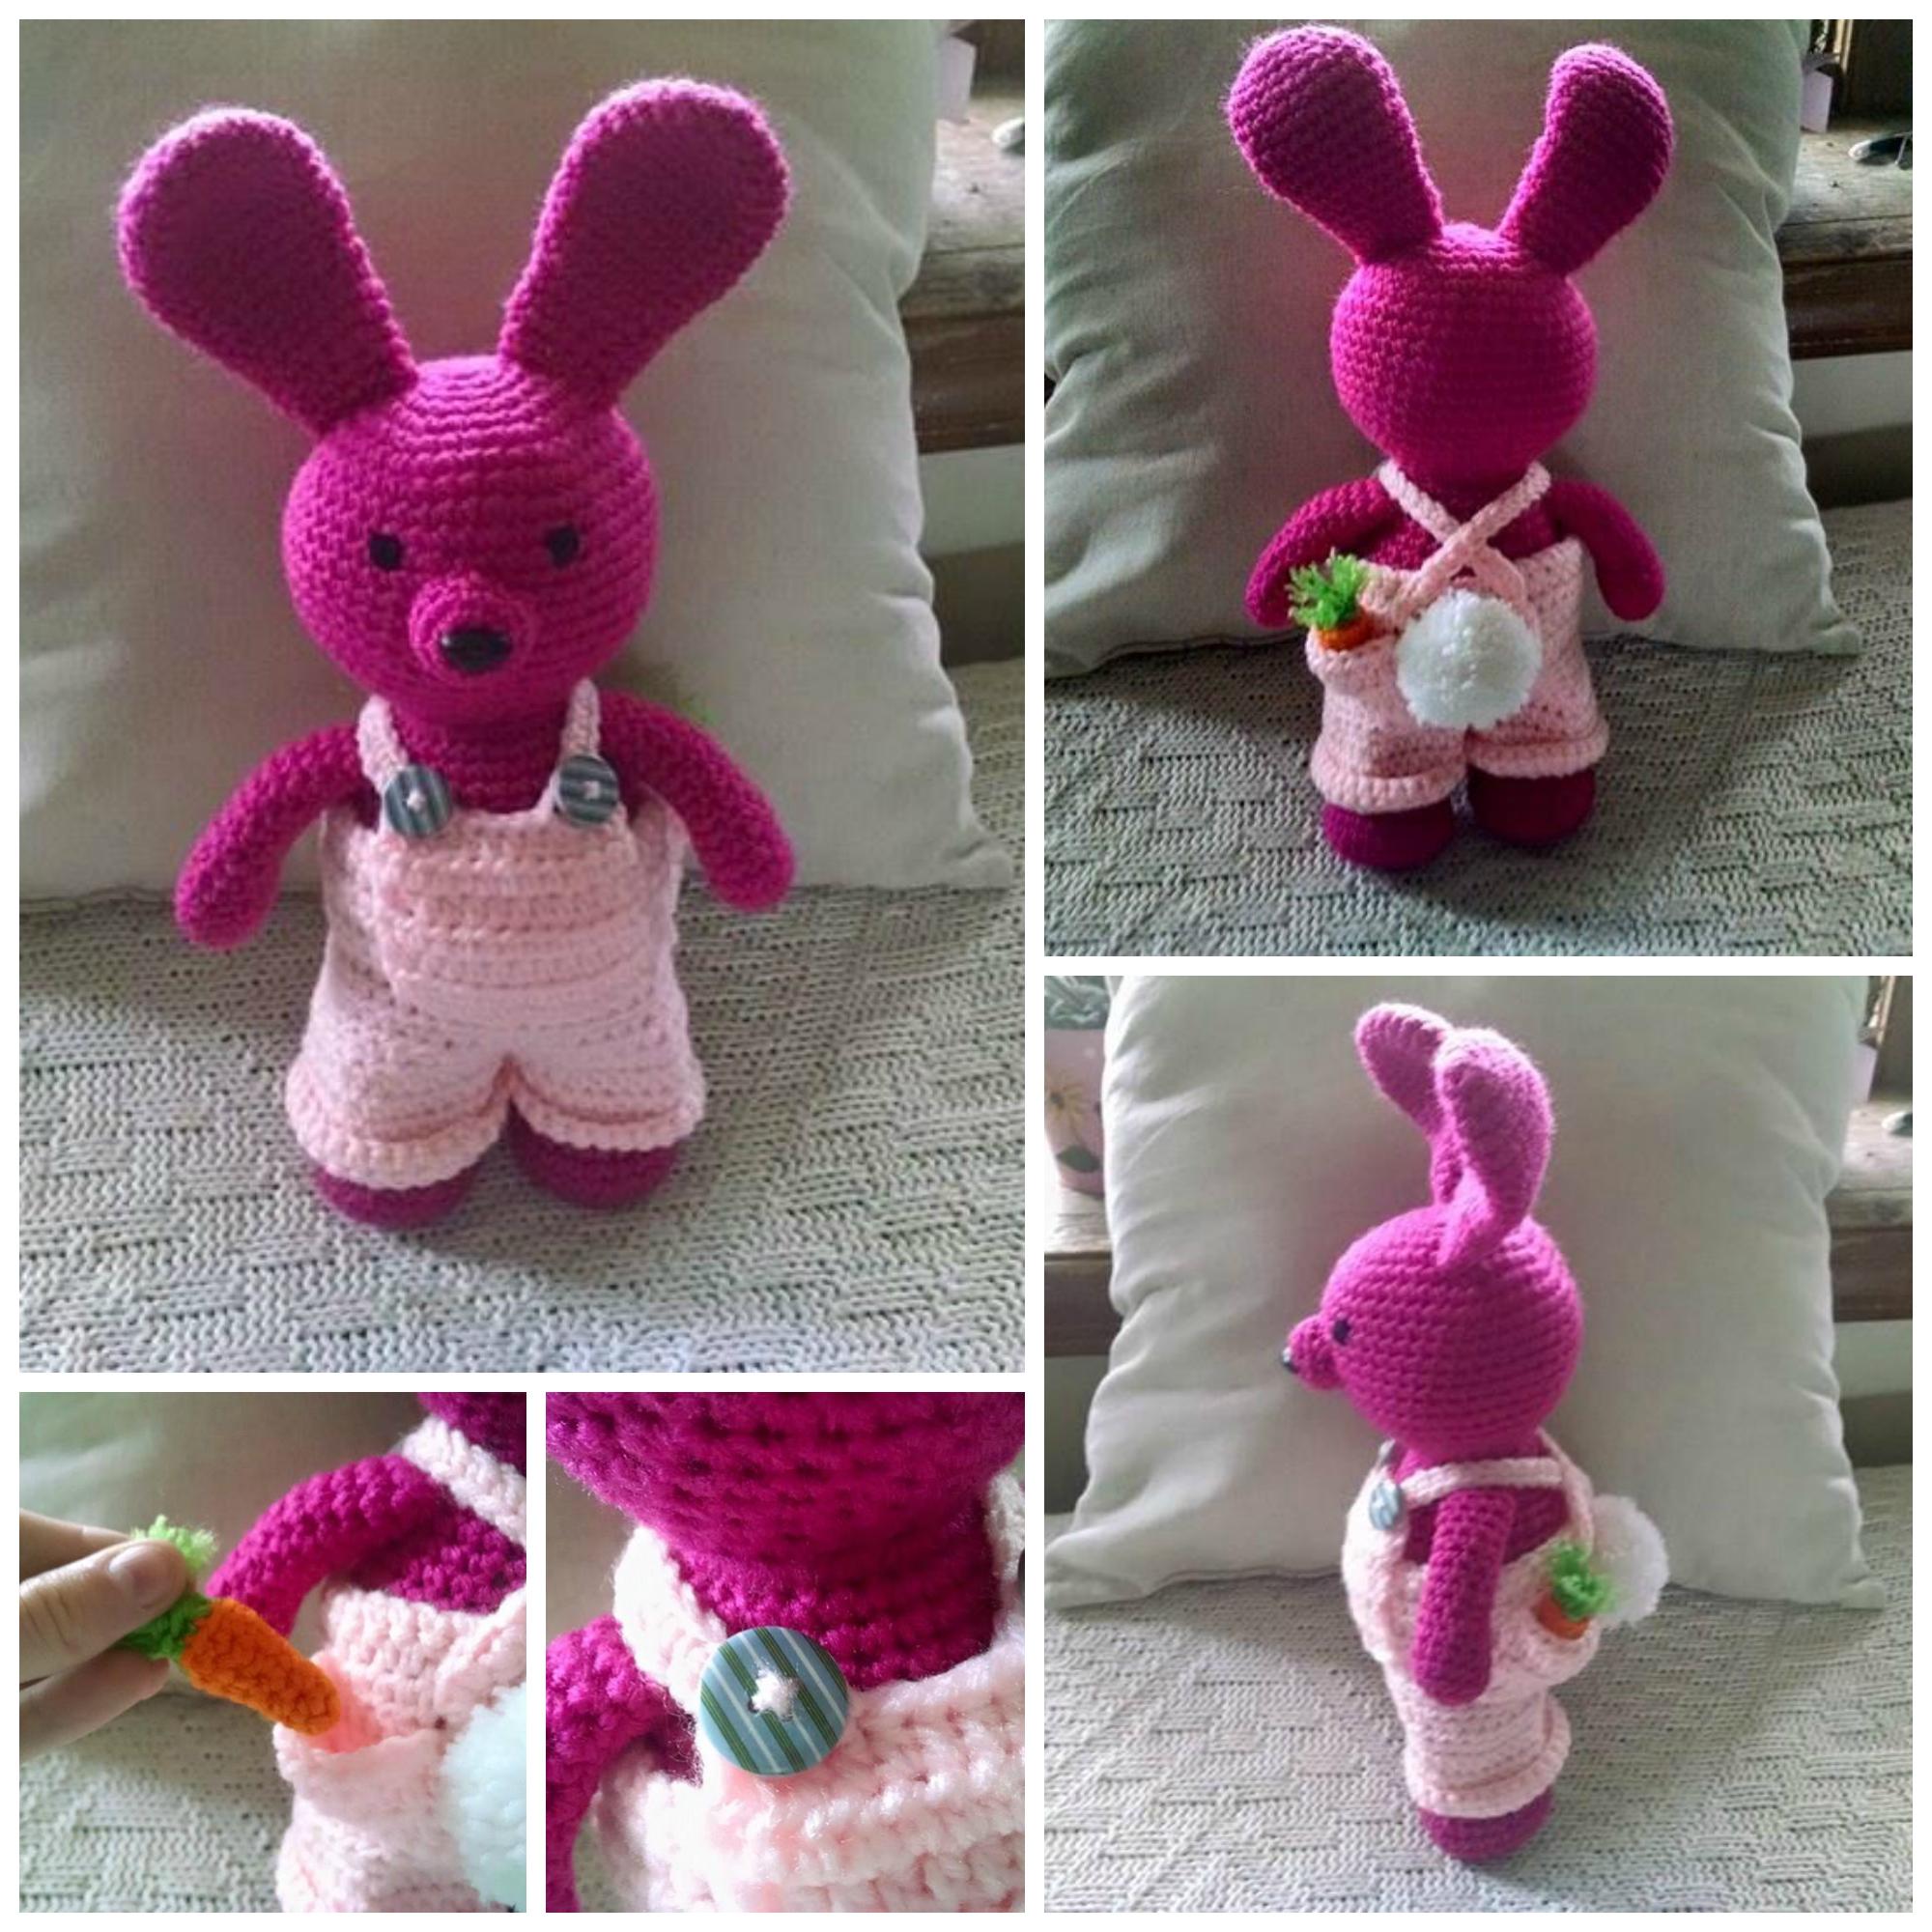 Amigurumi crochet easter bunny by mickeycricky on deviantart amigurumi crochet easter bunny by mickeycricky amigurumi crochet easter bunny by mickeycricky ccuart Choice Image